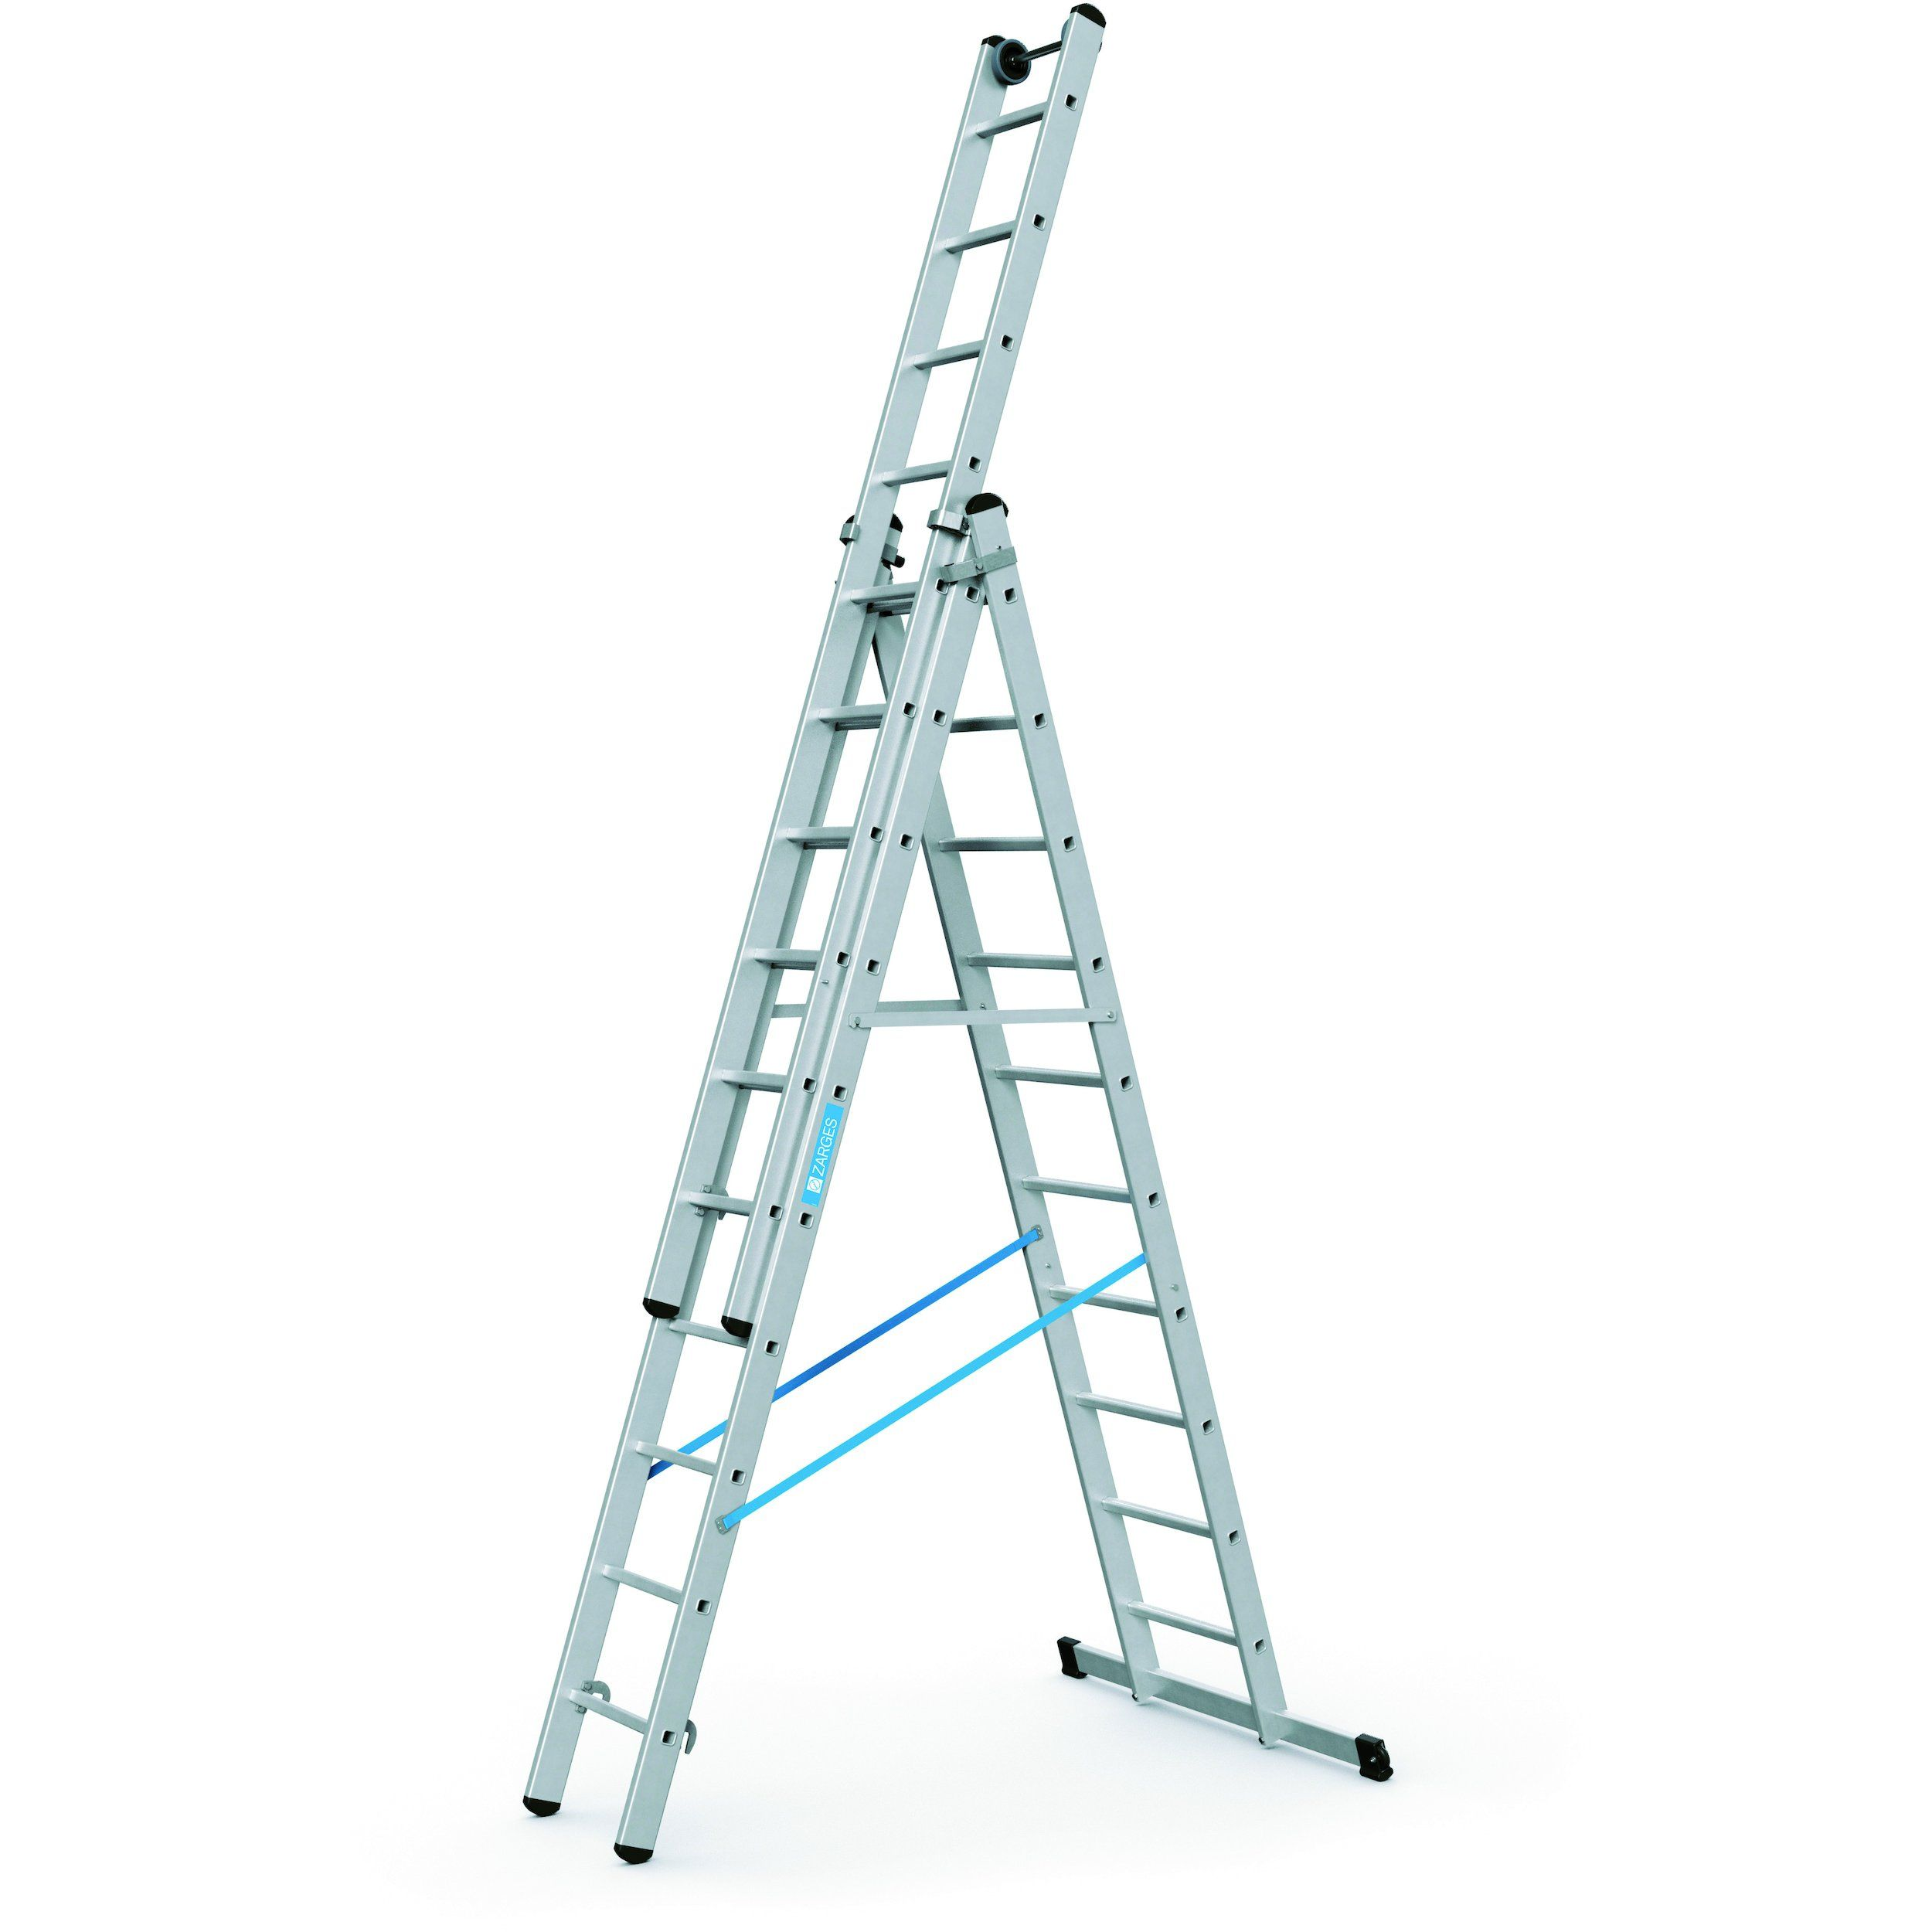 006711 combi ladder.jpg